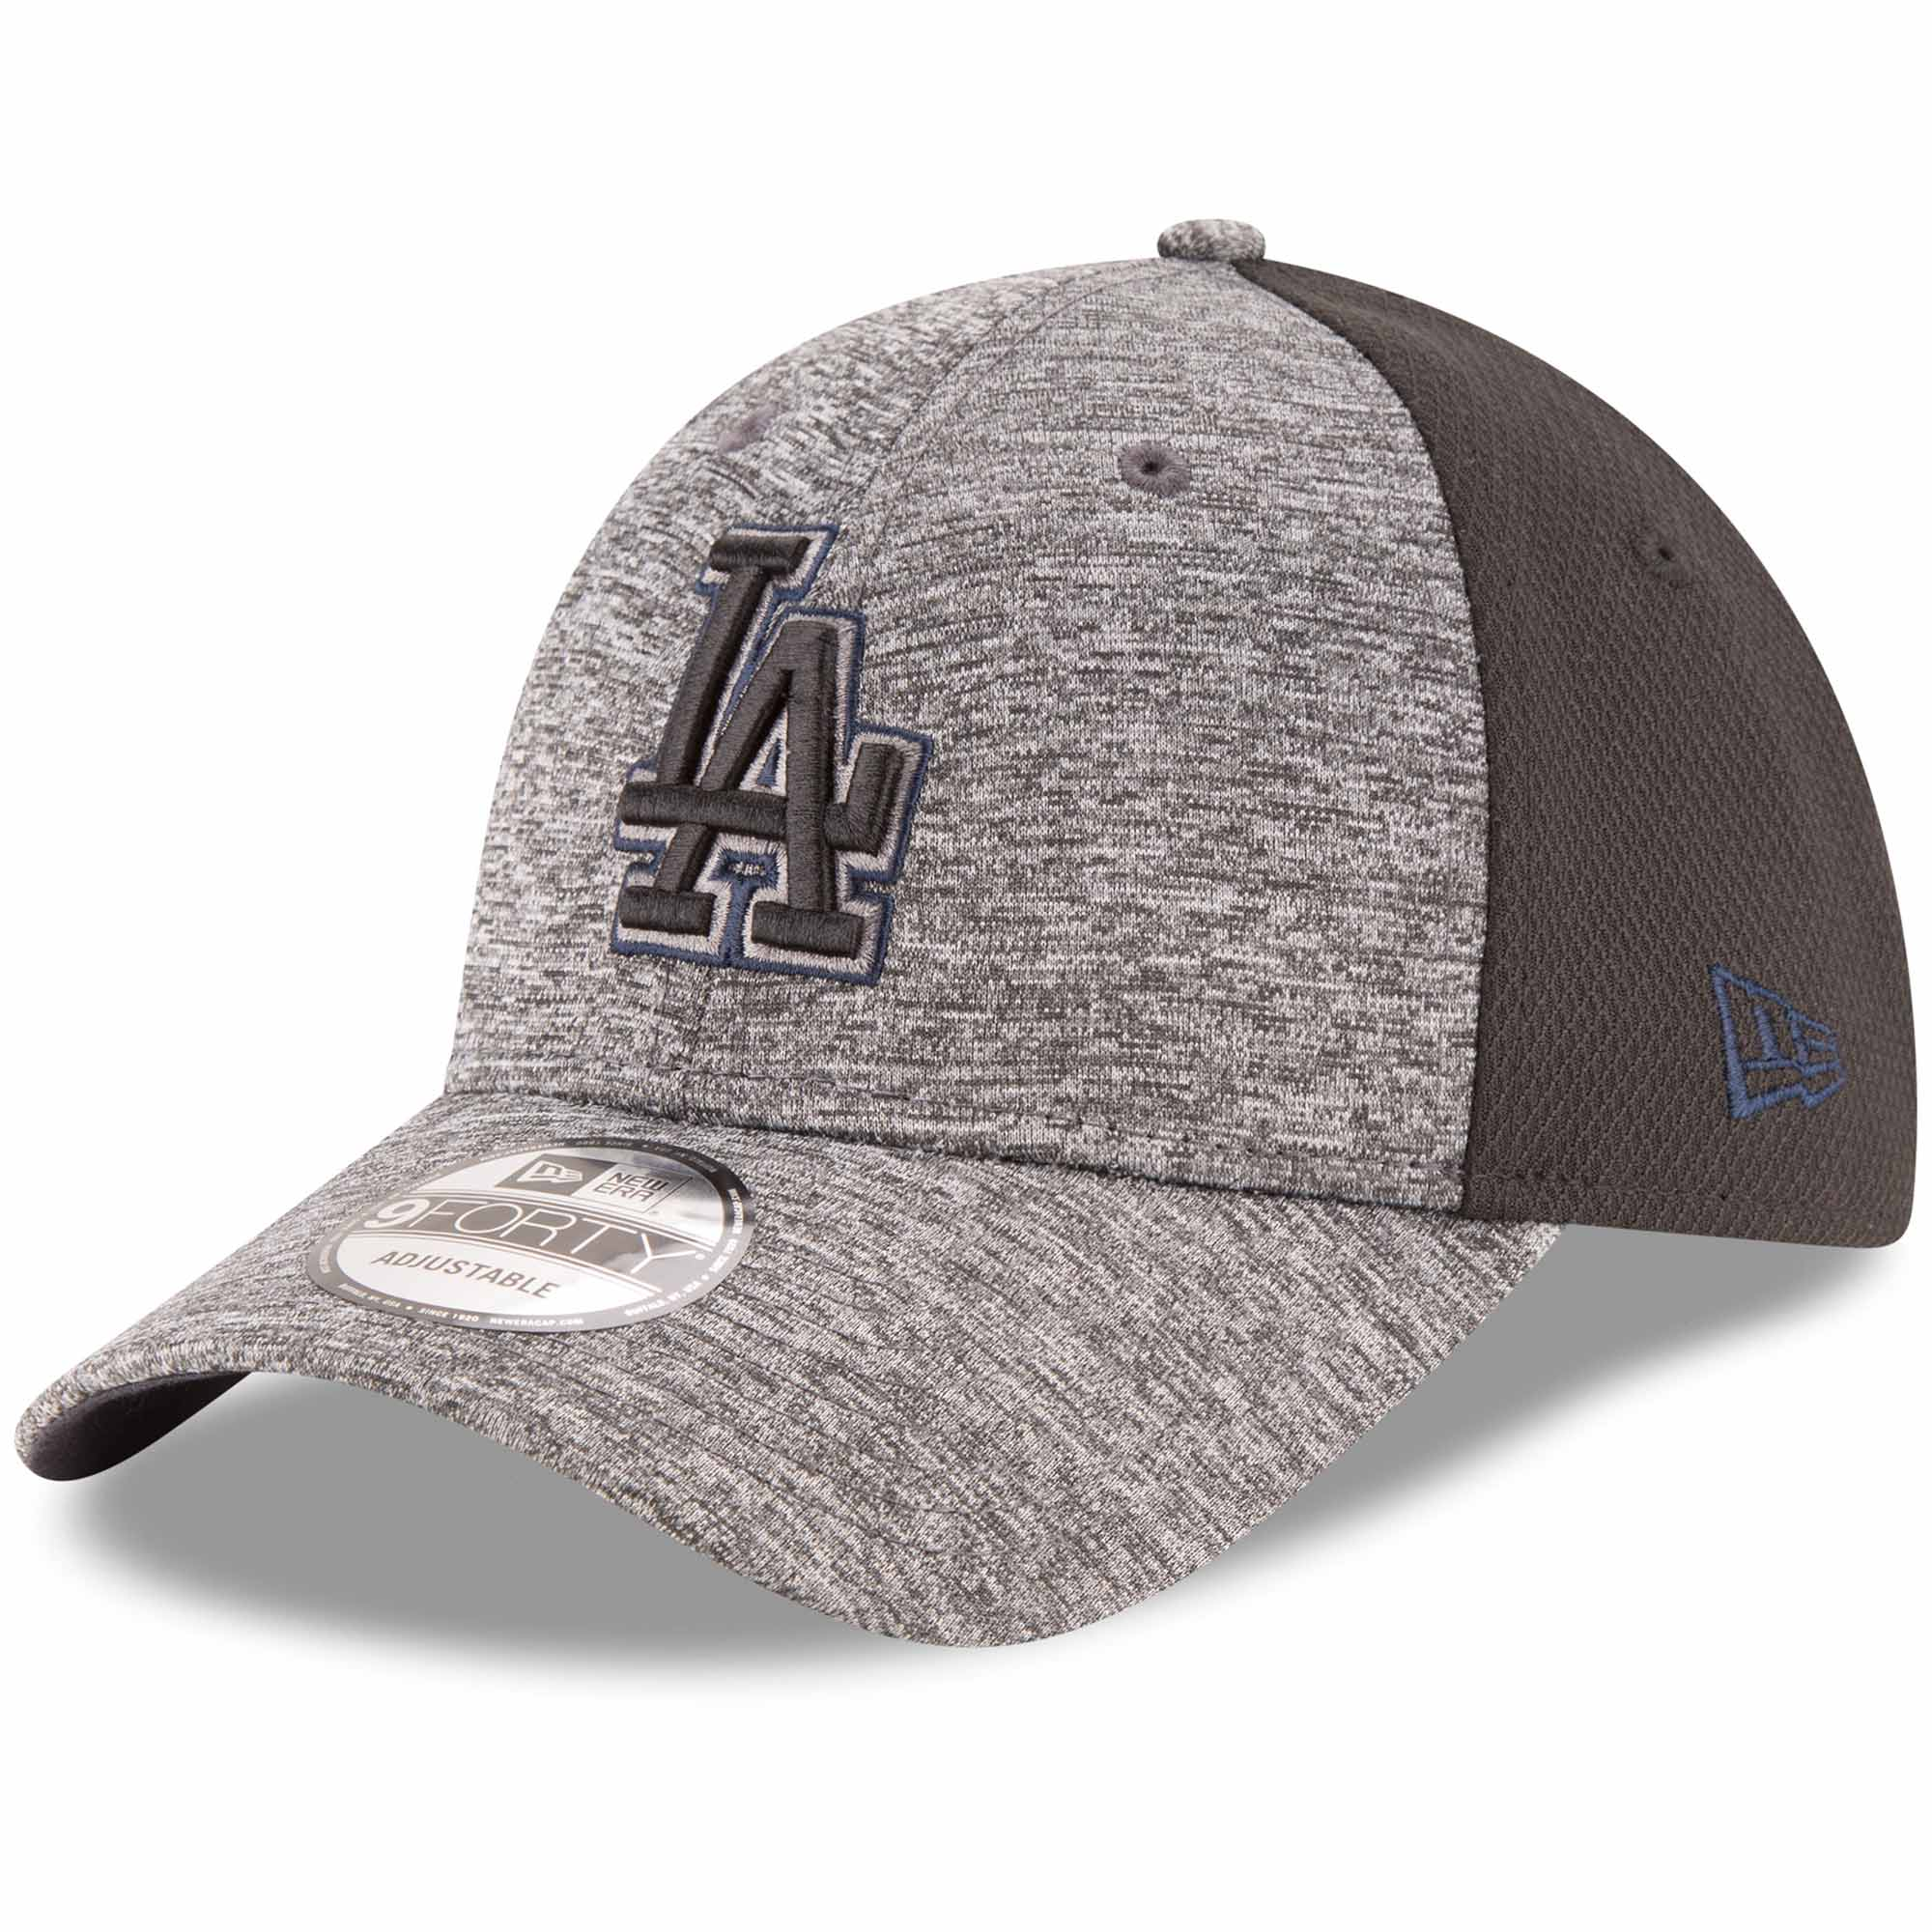 Los Angeles Dodgers New Era Shadowed Team Logo 9FORTY Adjustable Hat - Heathered Gray/Black - OSFA